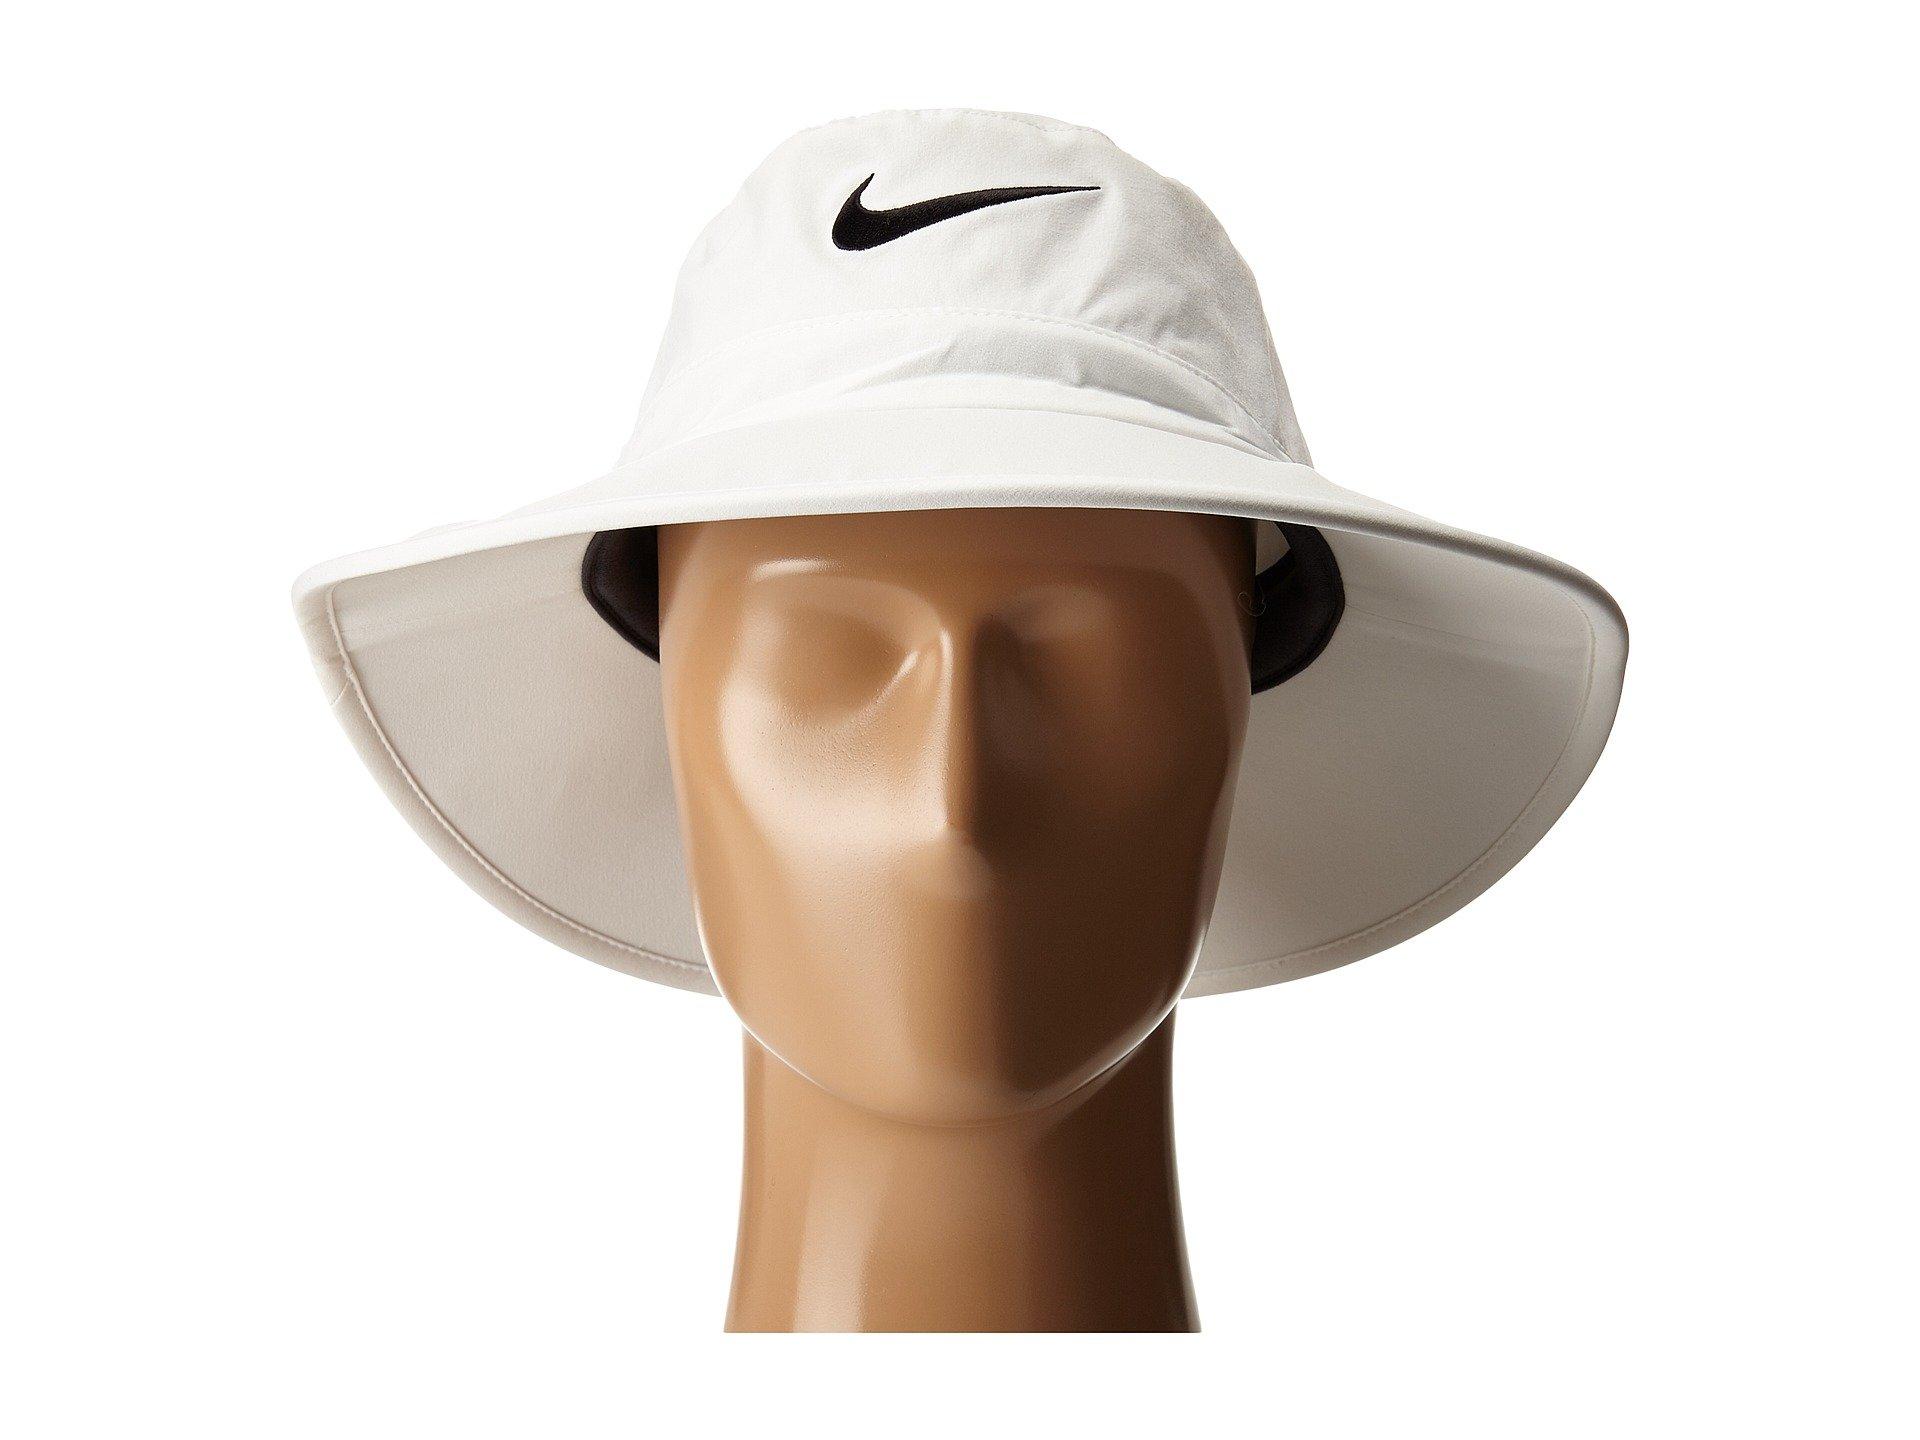 Nike Golf Bucket Hat Australia - Hat HD Image Ukjugs.Org b973c7d7f3a